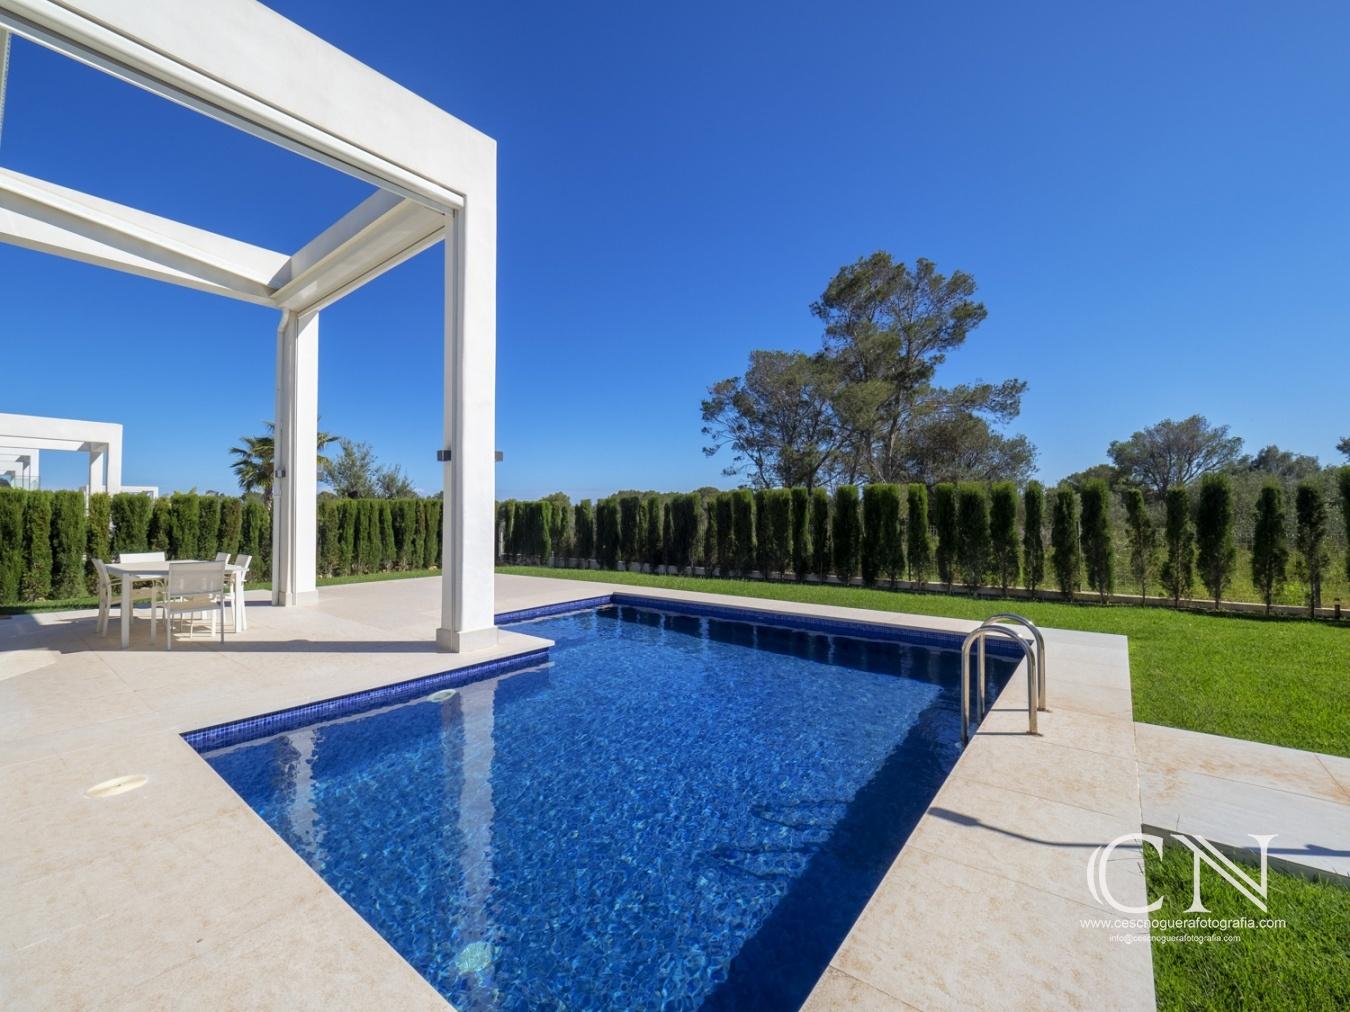 Casa a Cala Murada - Cesc Noguera Photographie, Architectural & Interior design photographer / Landscape Photography